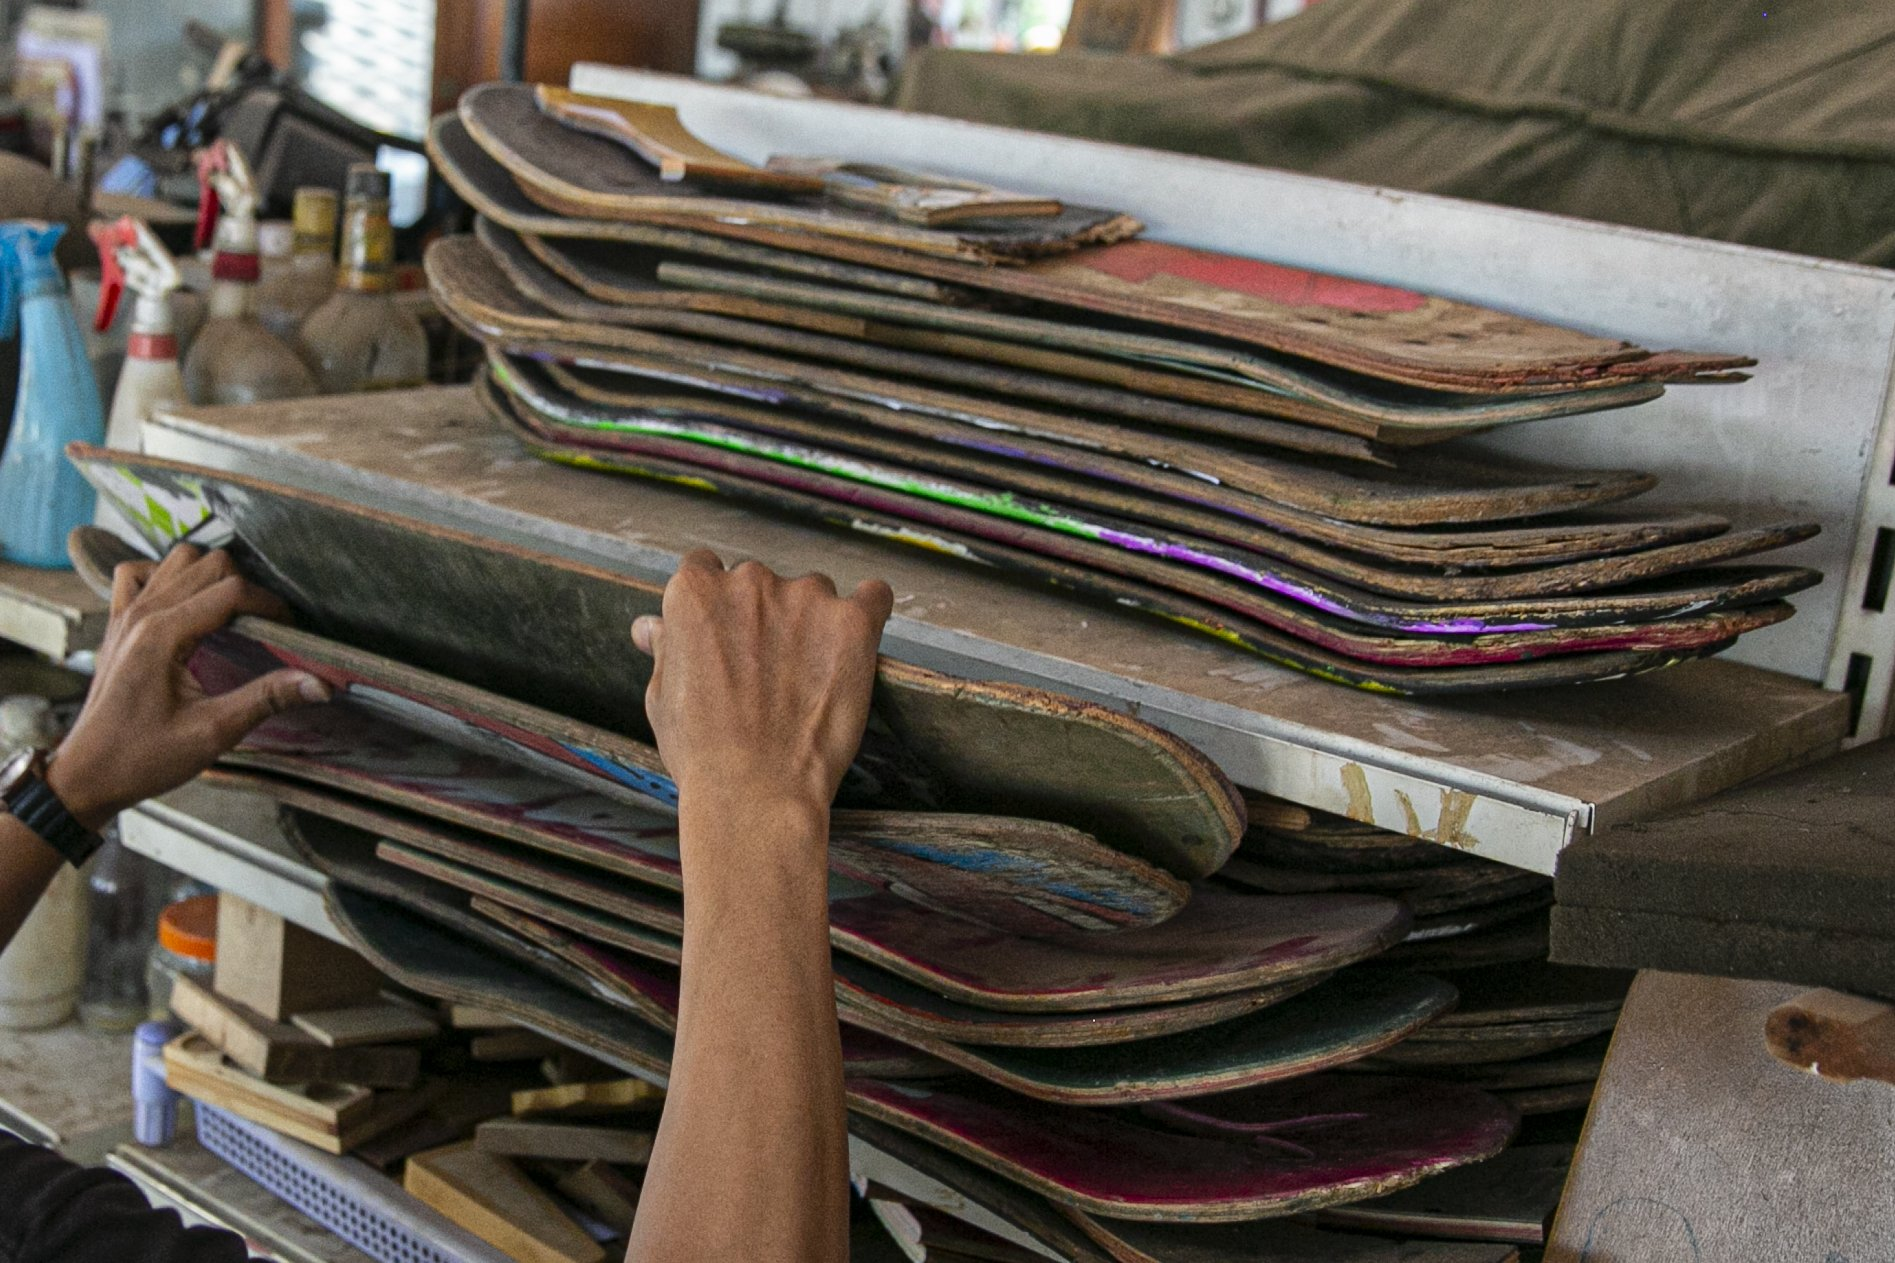 Pendiri brand kacamata Kabau, Reynanto Akhmad Aditya (35) memilih bahan skateboard Untuk pesanan kacamata kayu di workshopnya di kawasan Kramat Jati, Jakarta Timur, Kamis (1/10/2020). Dibuat dari limbah papan skate, produk kacamata tersebut dibandrol dengan harga mulai dari Rp. 1.200.000 hingga Rp. 1.500.000. Tidak hanya menyasar pasar lokal produk kacamata kabau juga sudah merambah ke pasar mancanegara seperti Australia, Amerika, Swiss, dan Jepang.